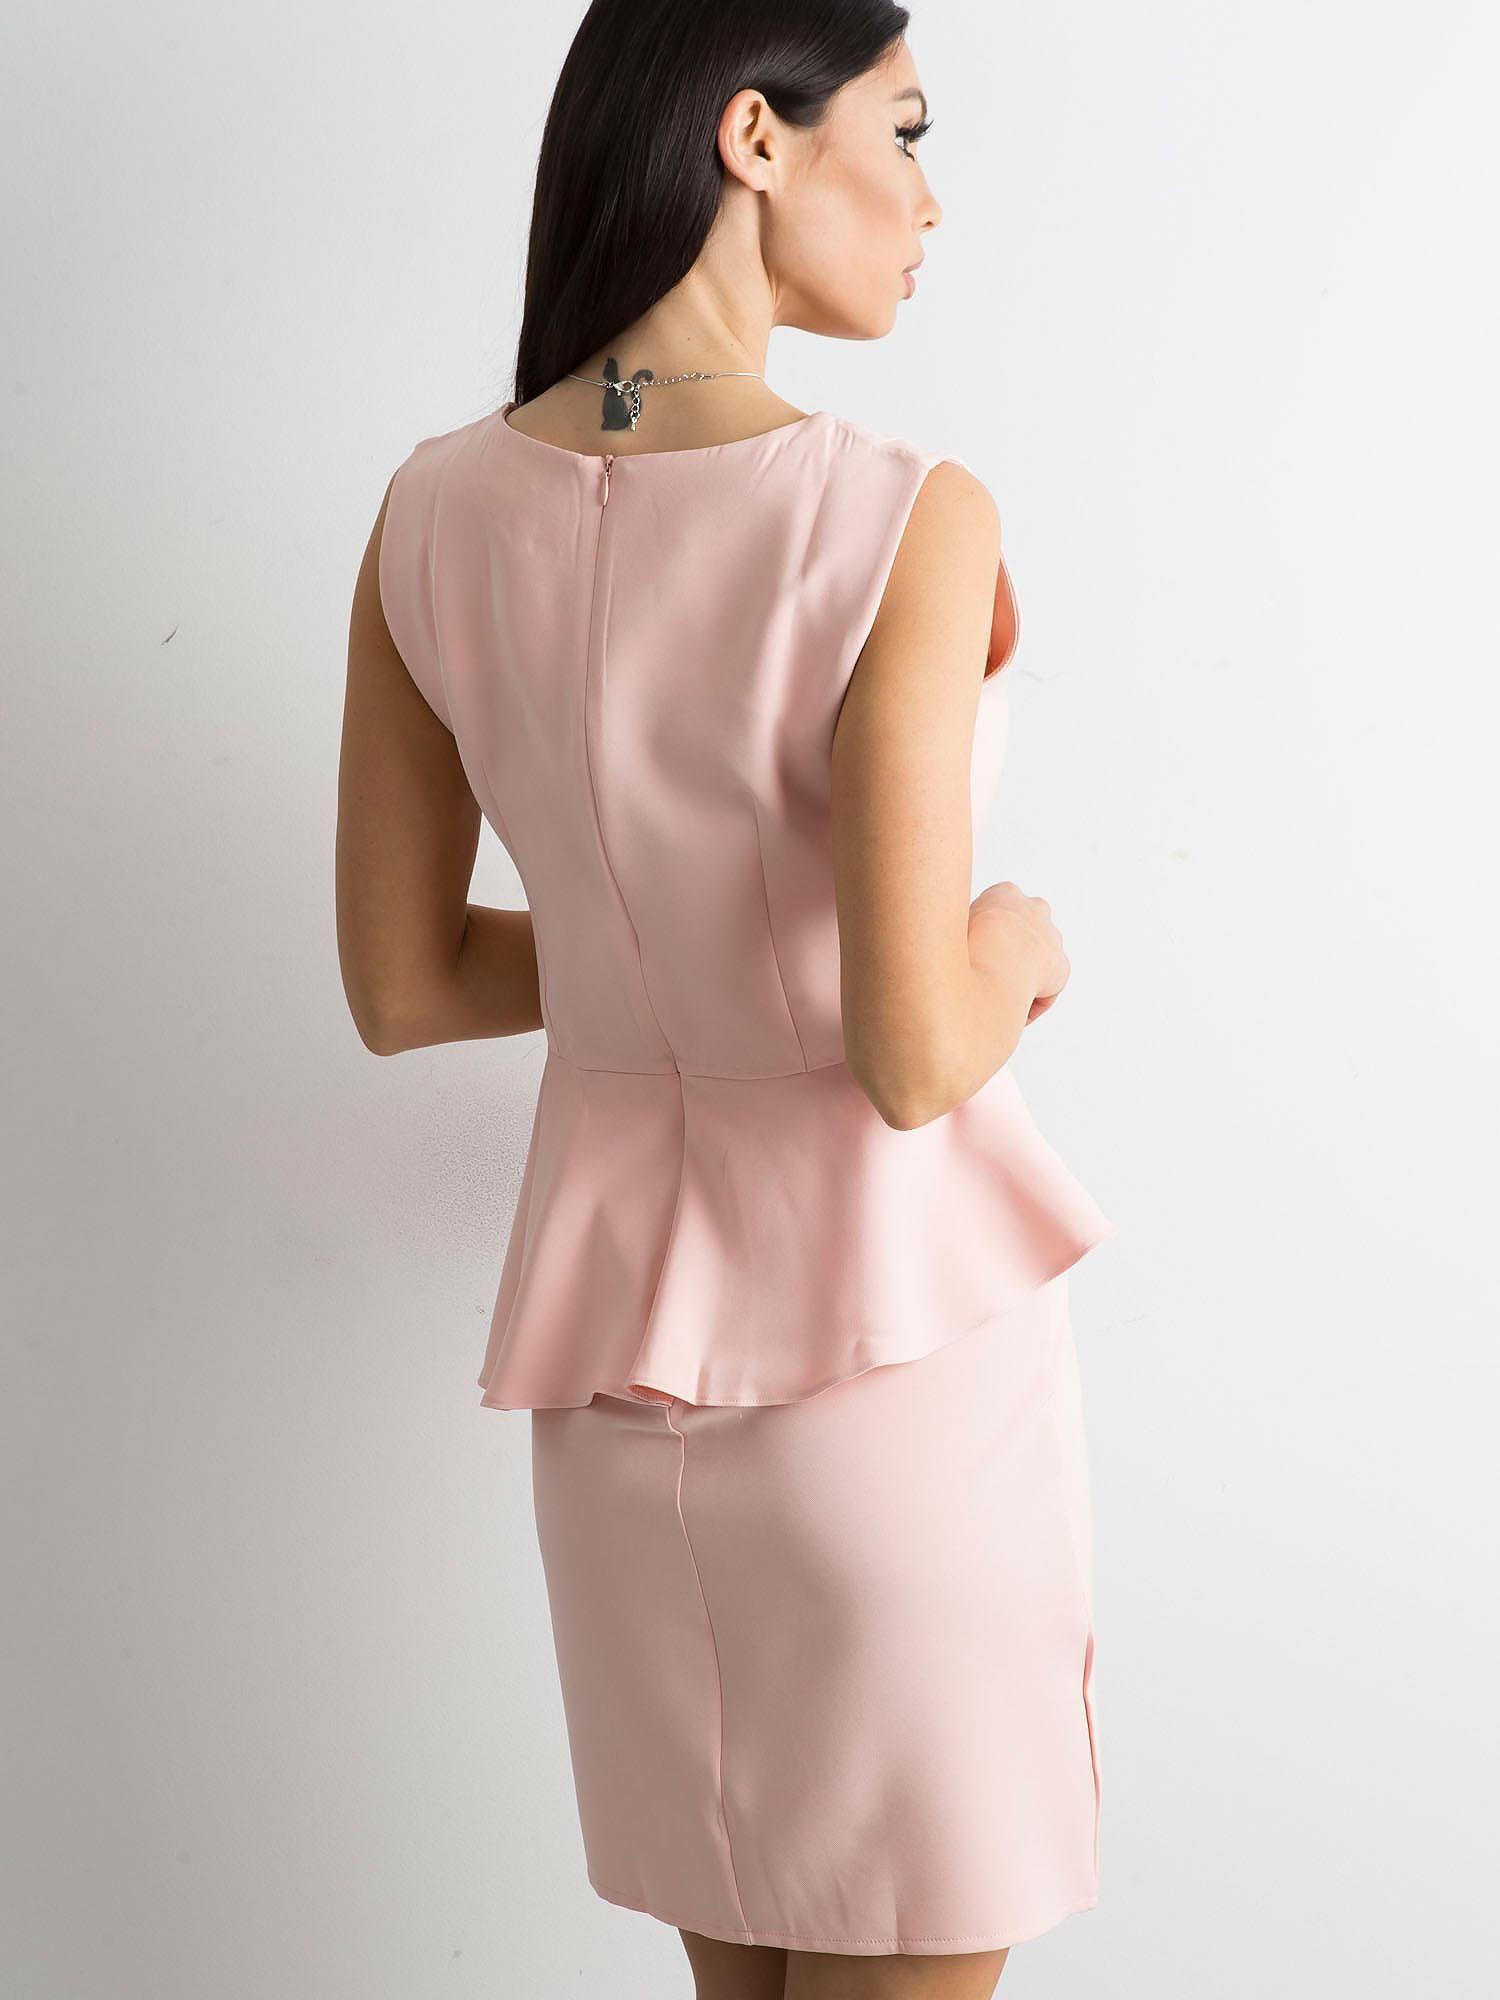 df6b4c3c7799 Jasnoróżowa sukienka z baskinką - Sukienka koktajlowa - sklep eButik.pl